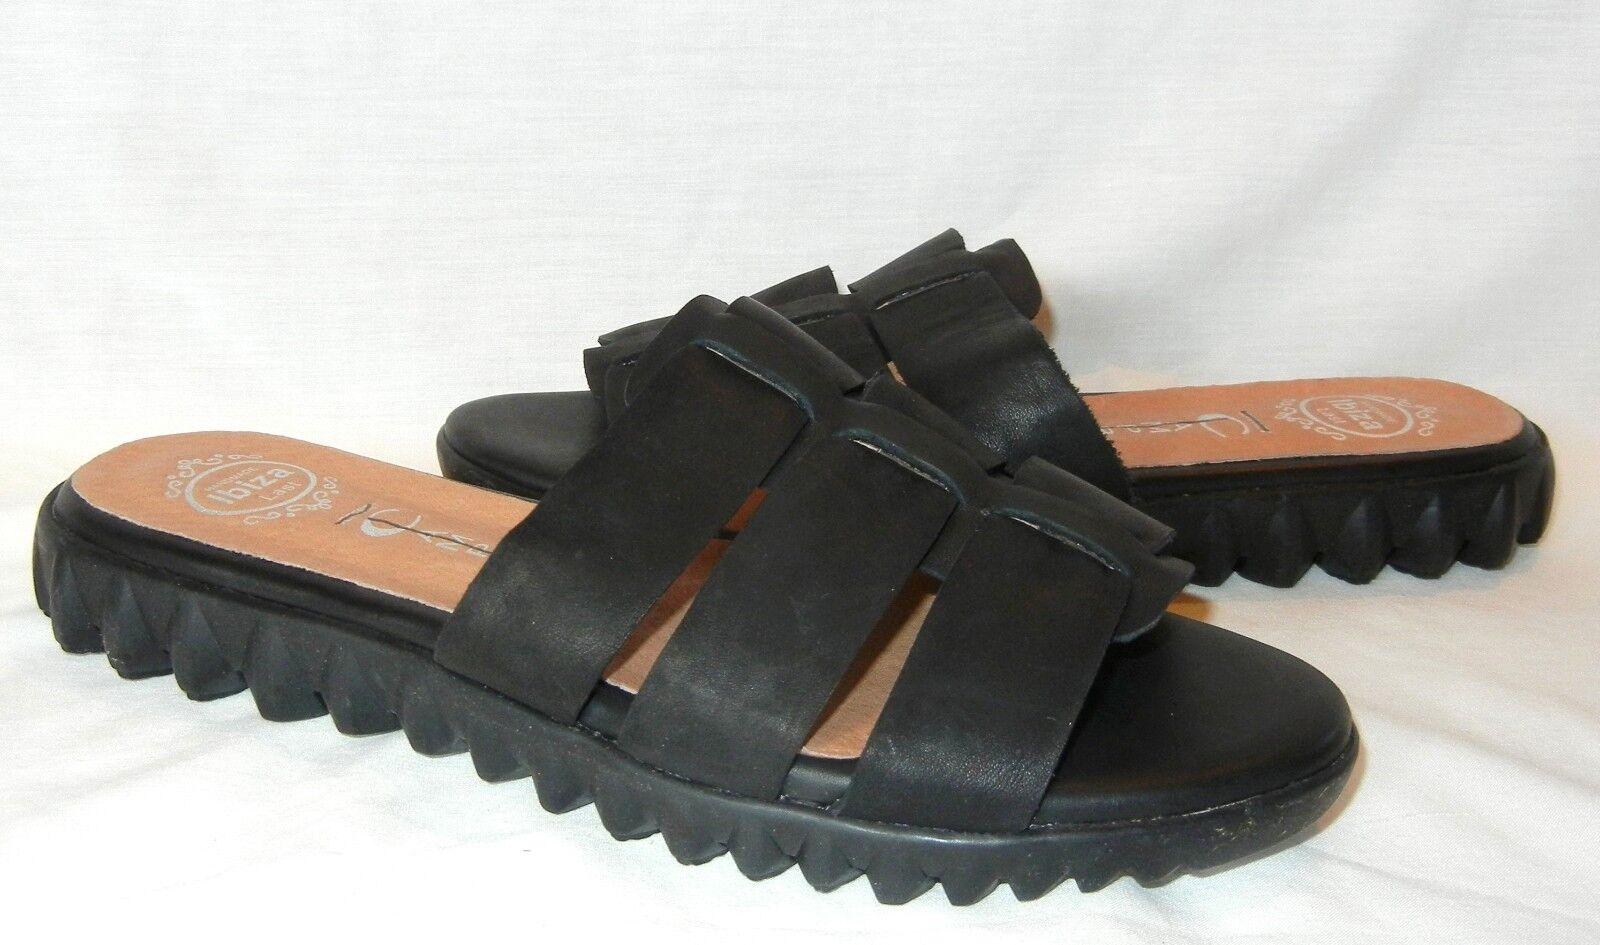 Jeffrey Campbell Women's Rochelle Slide Leather Sandals shoes Retail  120 size 7